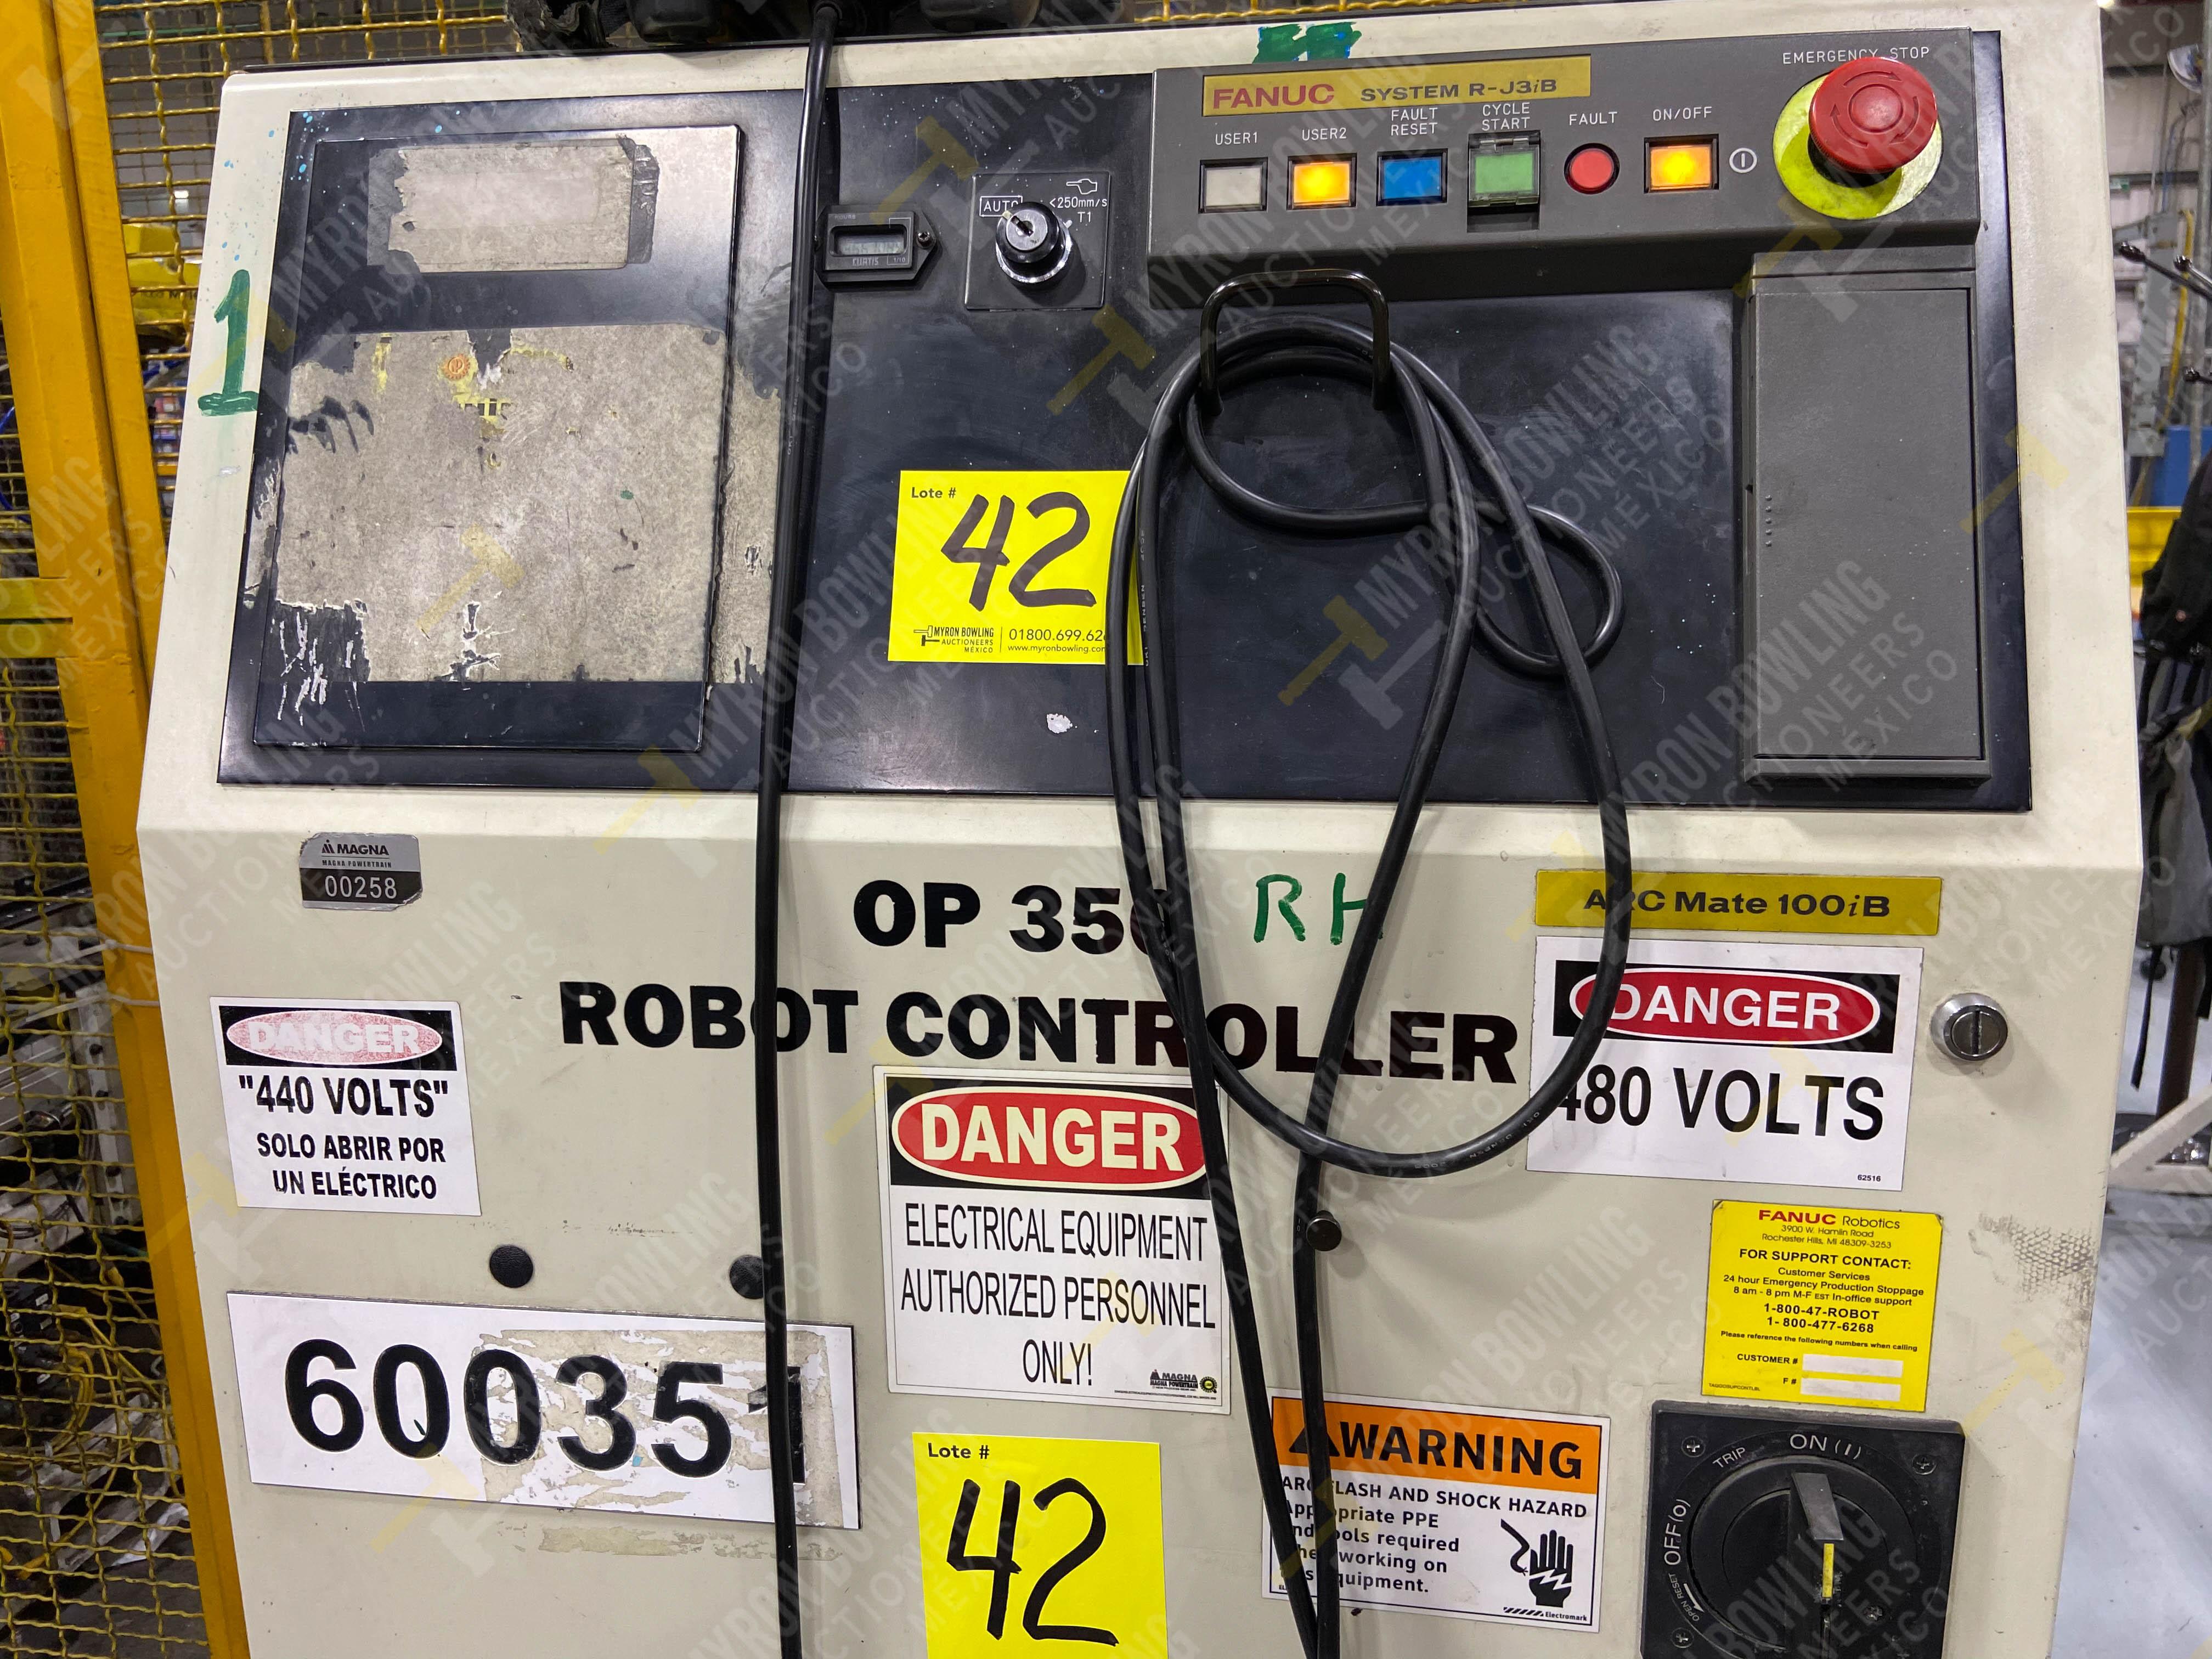 Robot marca Fanuc con capacidad de carga de 15-30 Kg, controlador de robot y teach pendant - Image 10 of 14